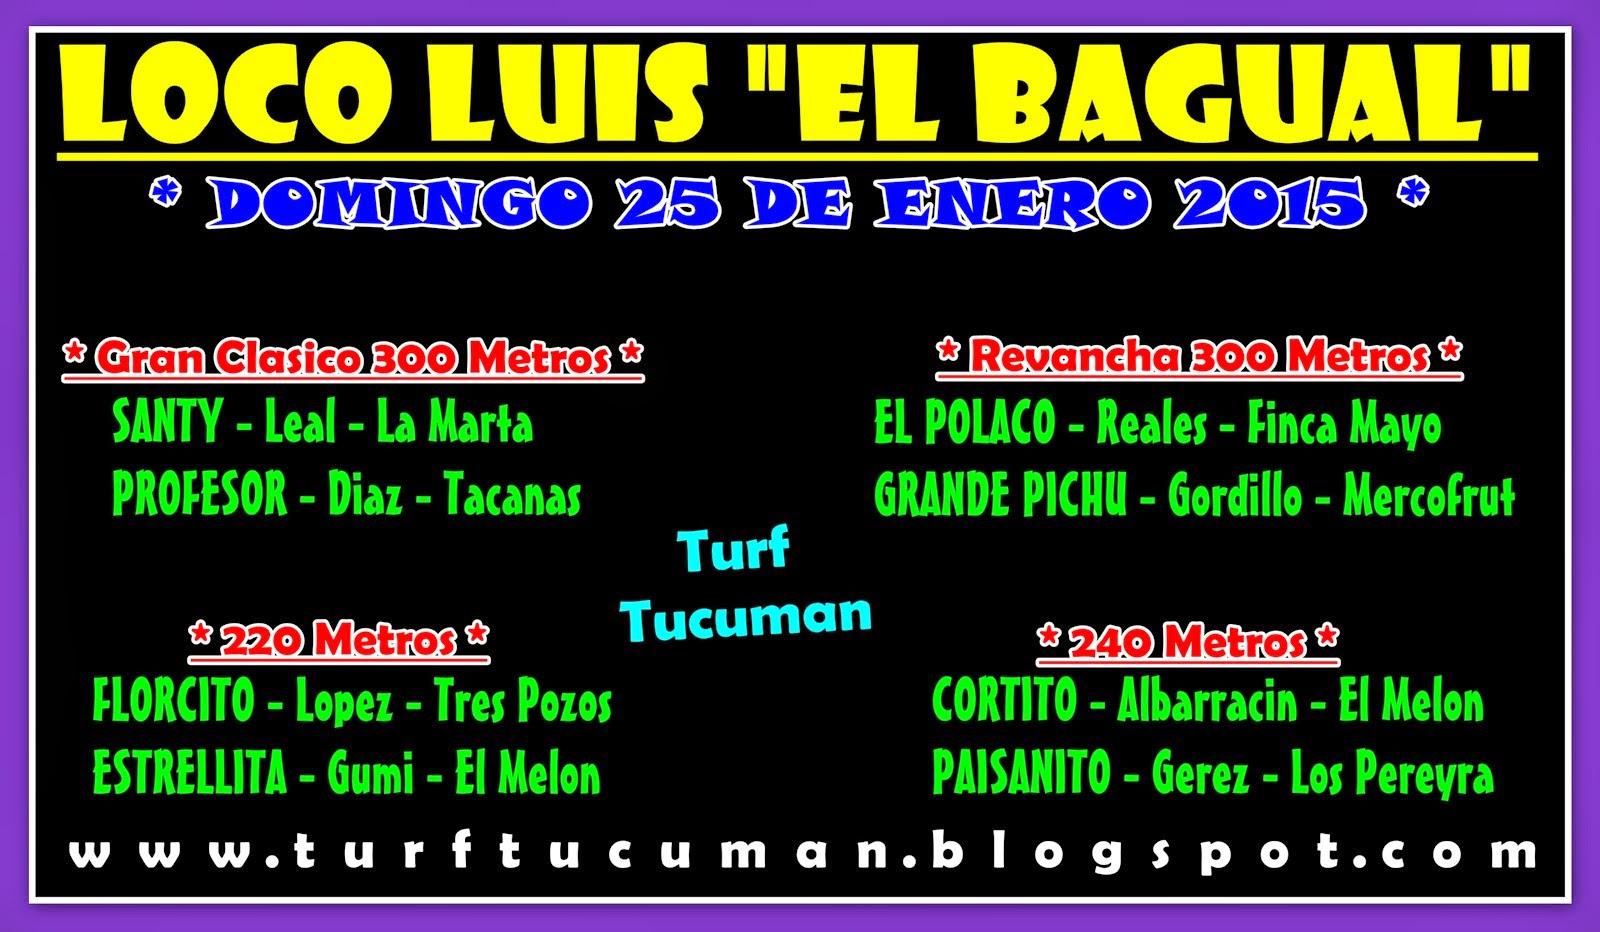 PROG LOCO LUIS